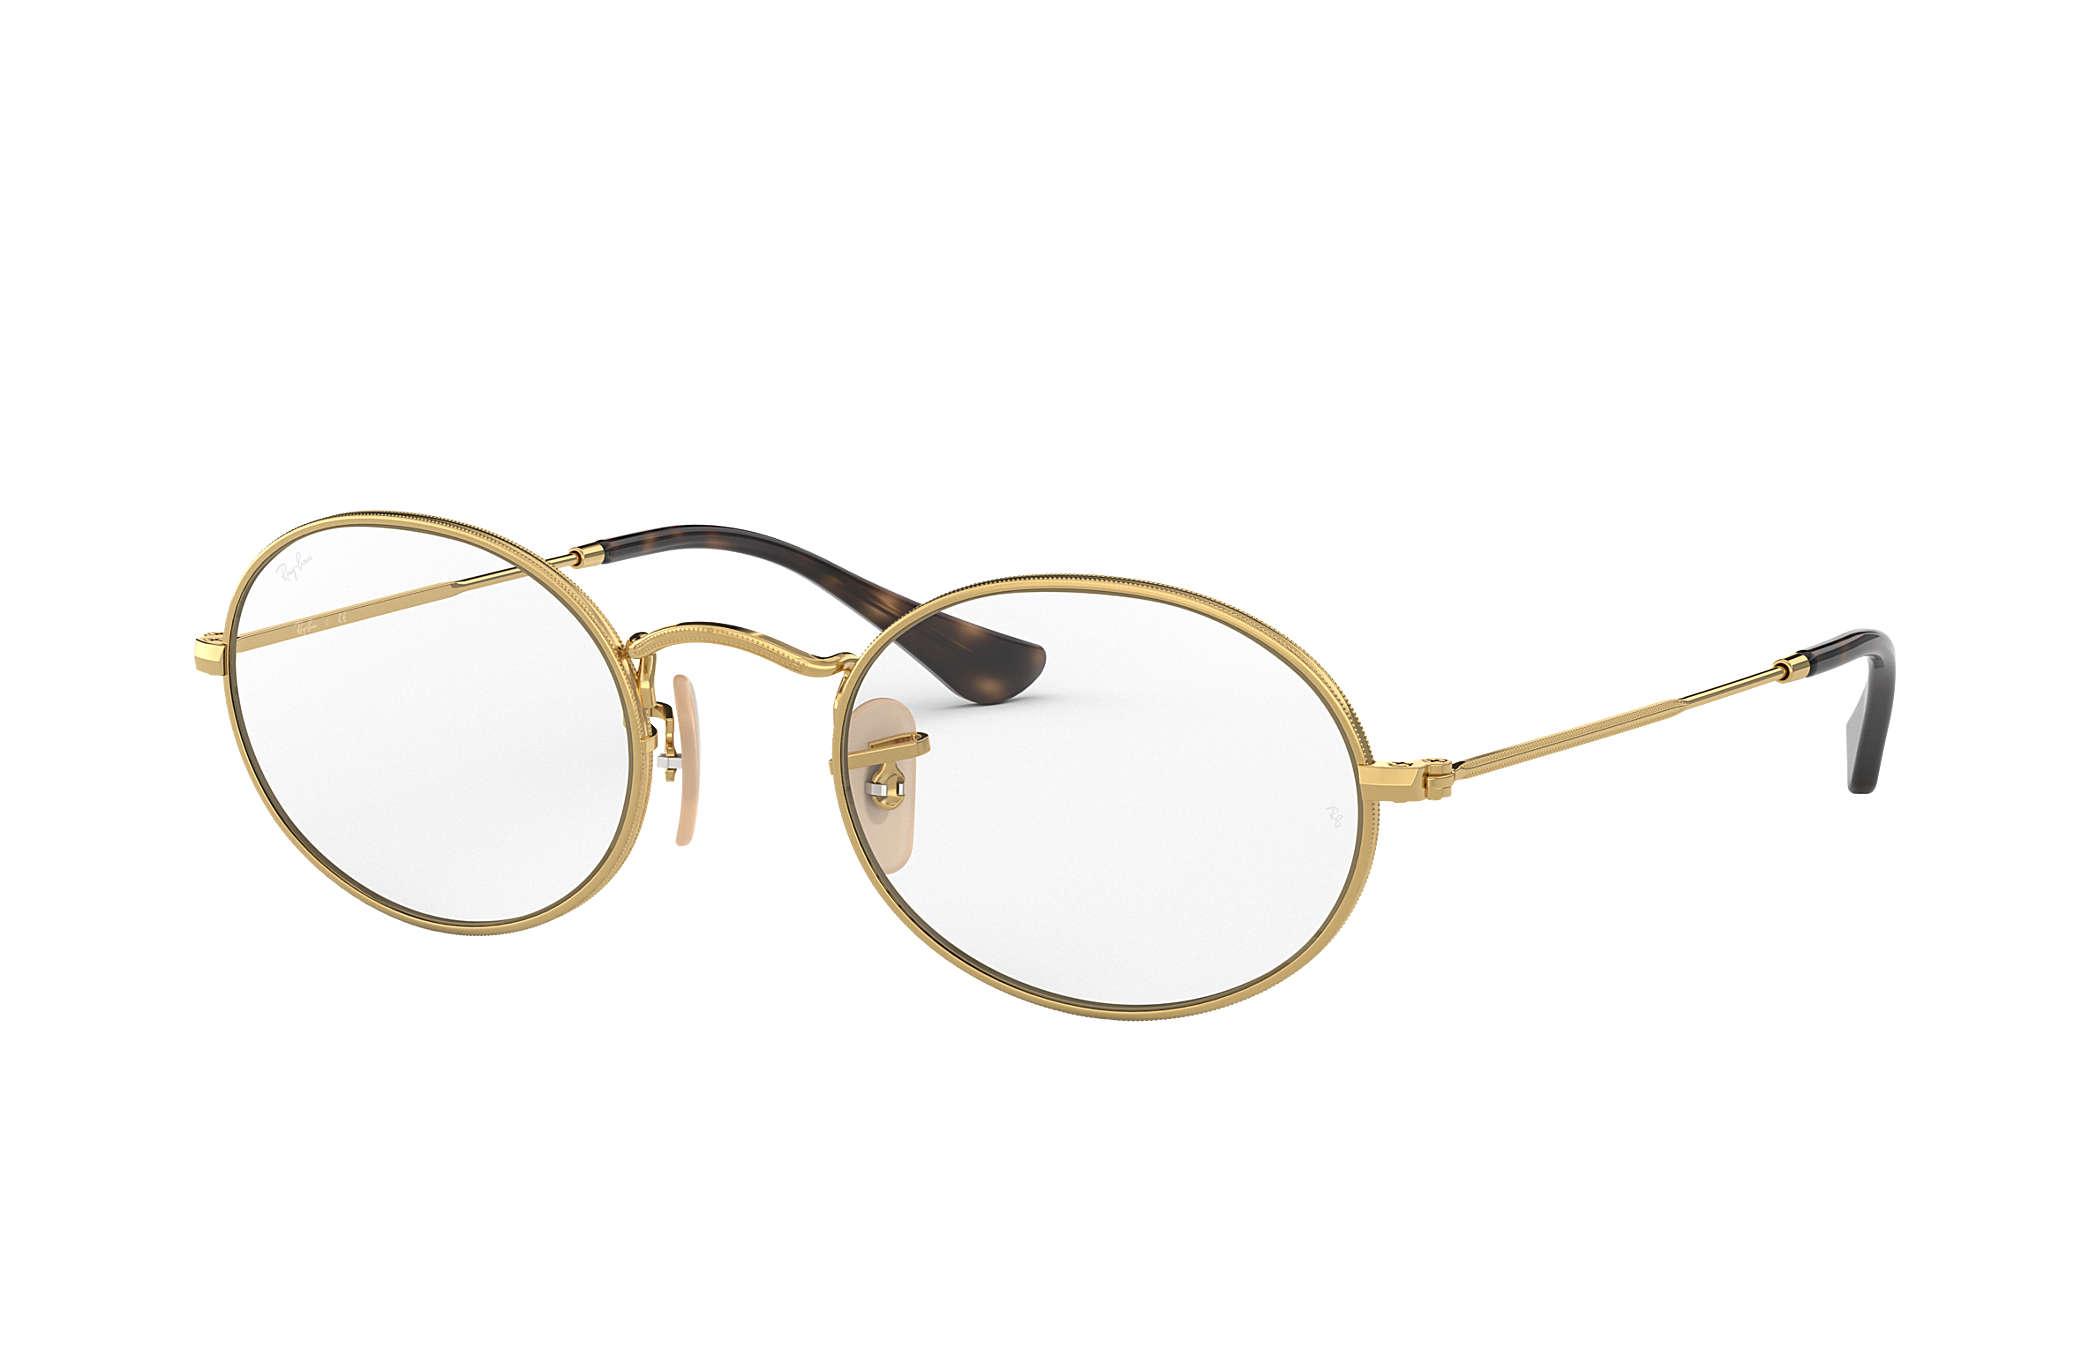 Ray-Ban prescription glasses Oval Optics RB3547V Gold - Metal ... 7910b5c623fc